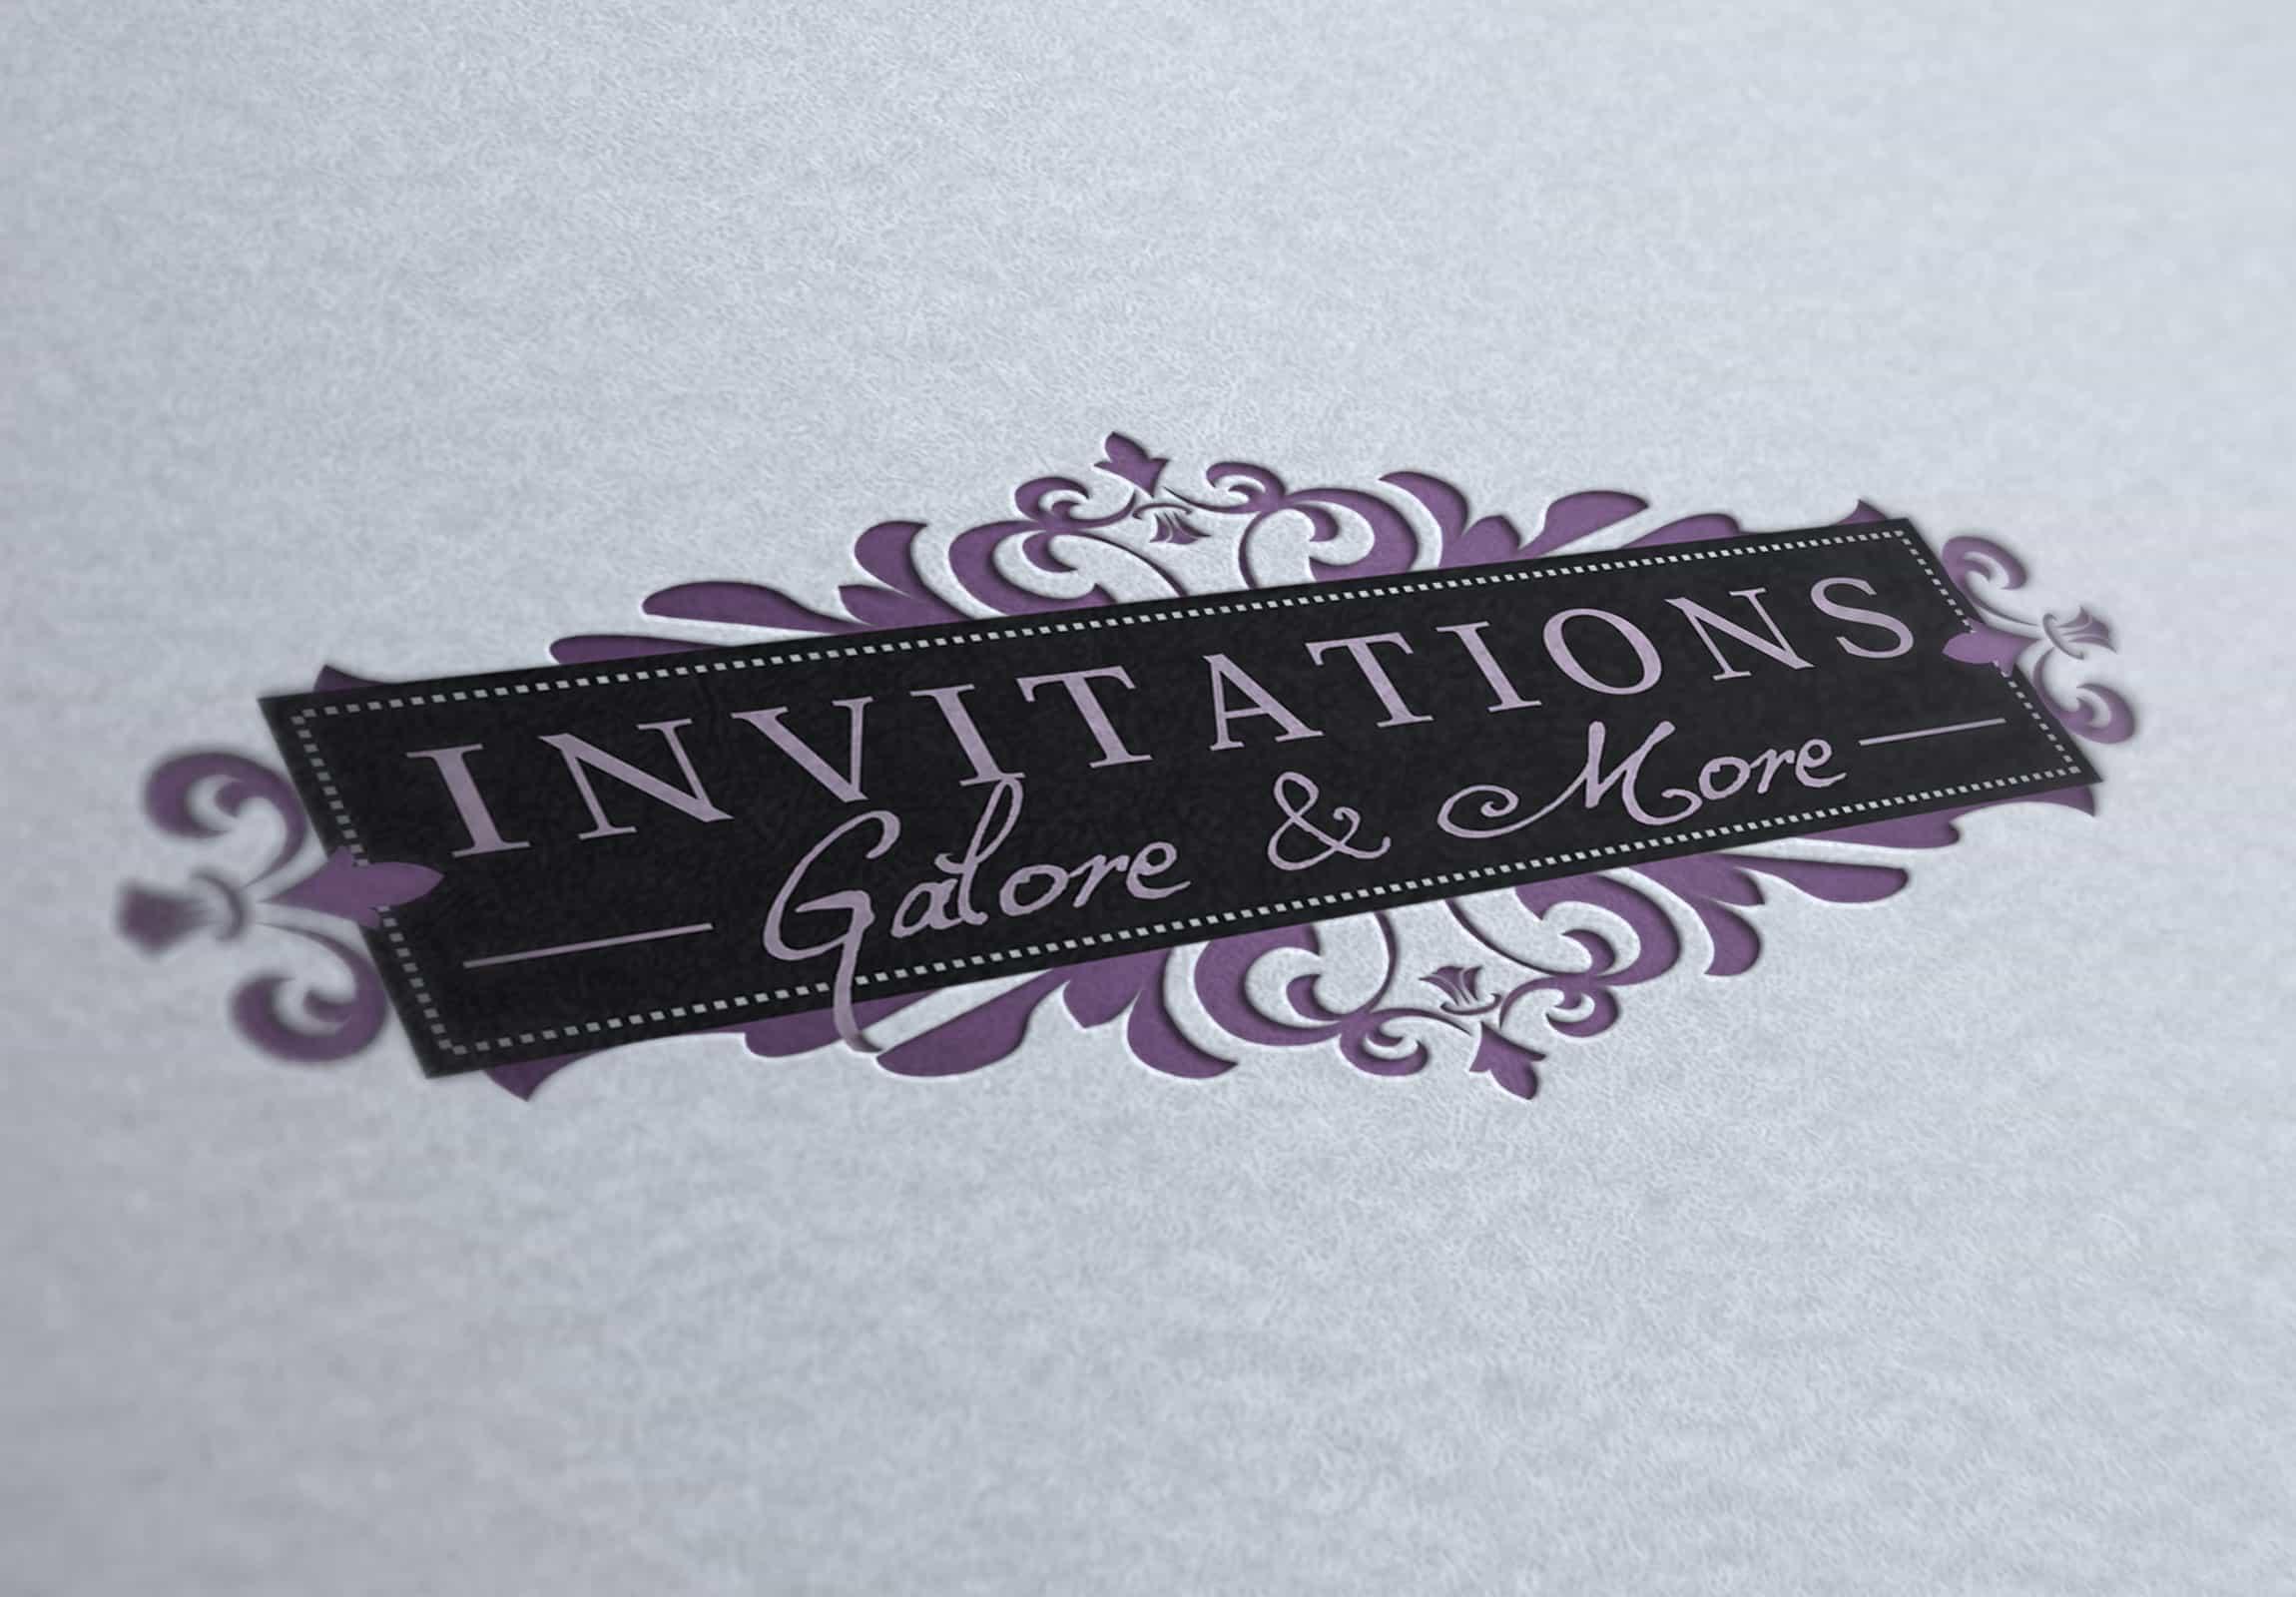 Invitations Galore & More - Branding & Marketing